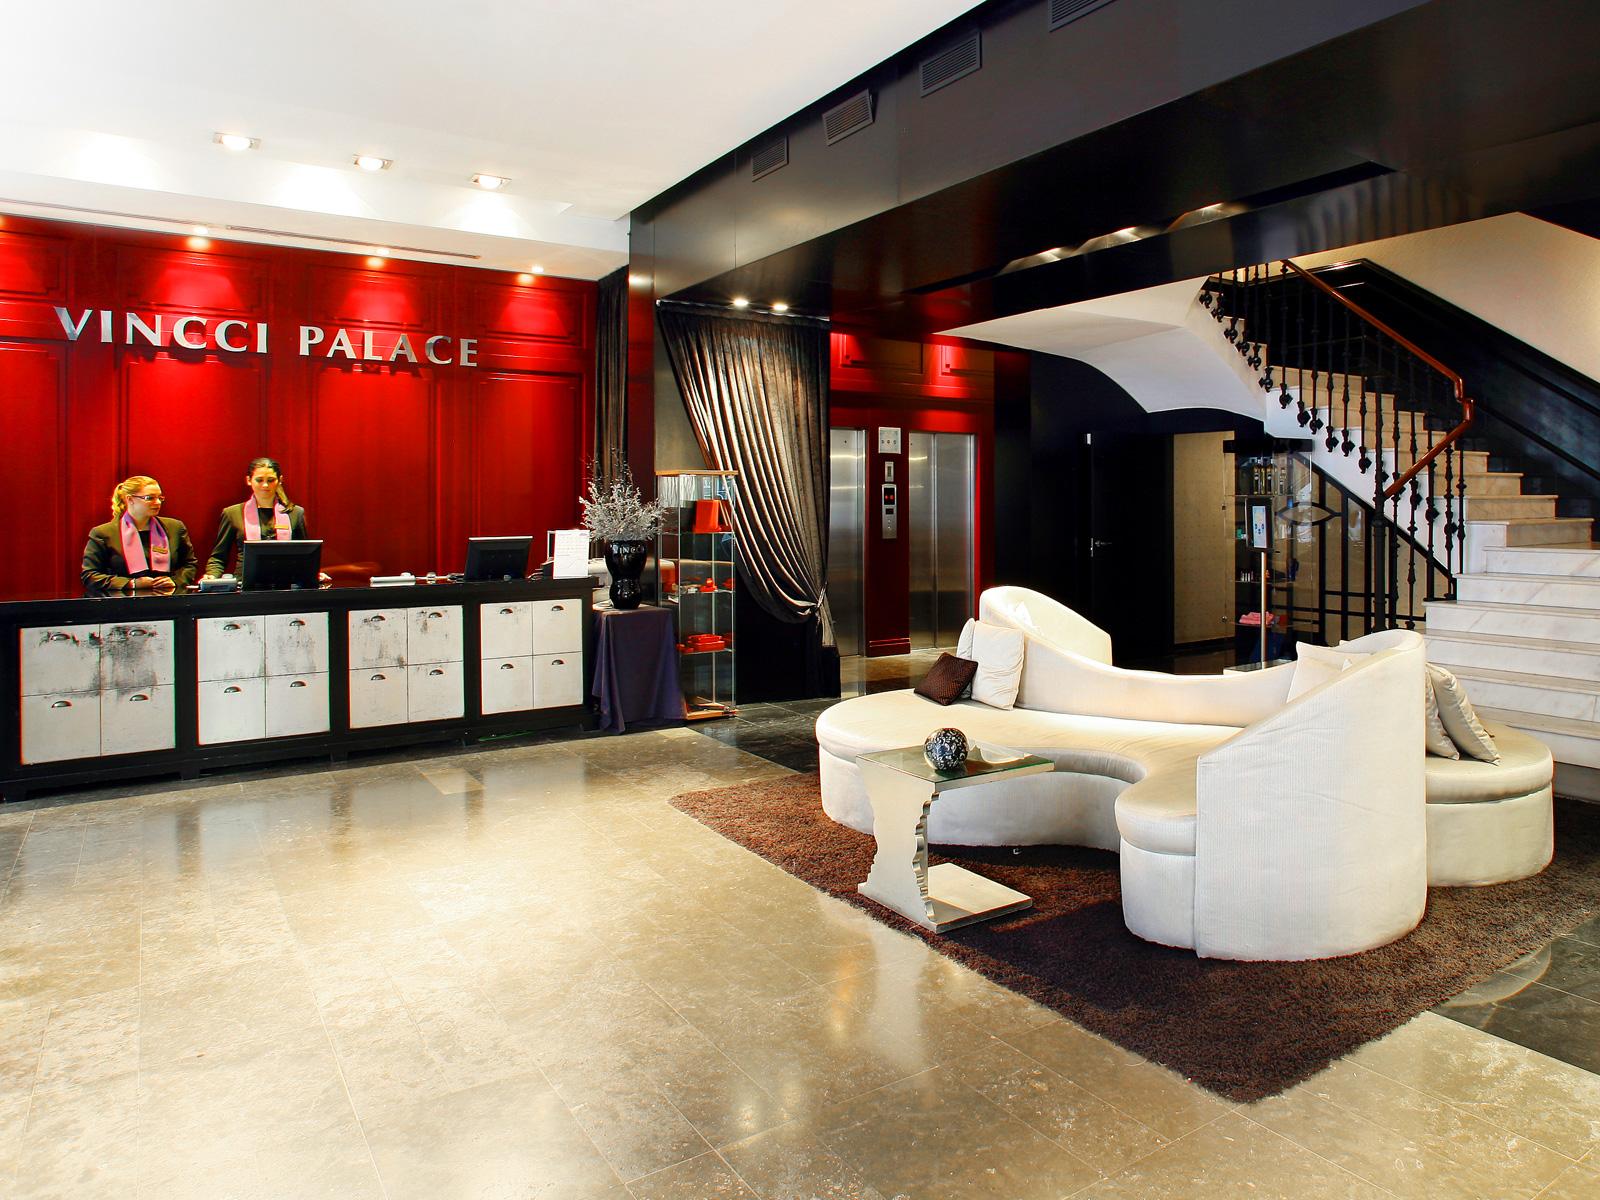 hotel vincci palace: